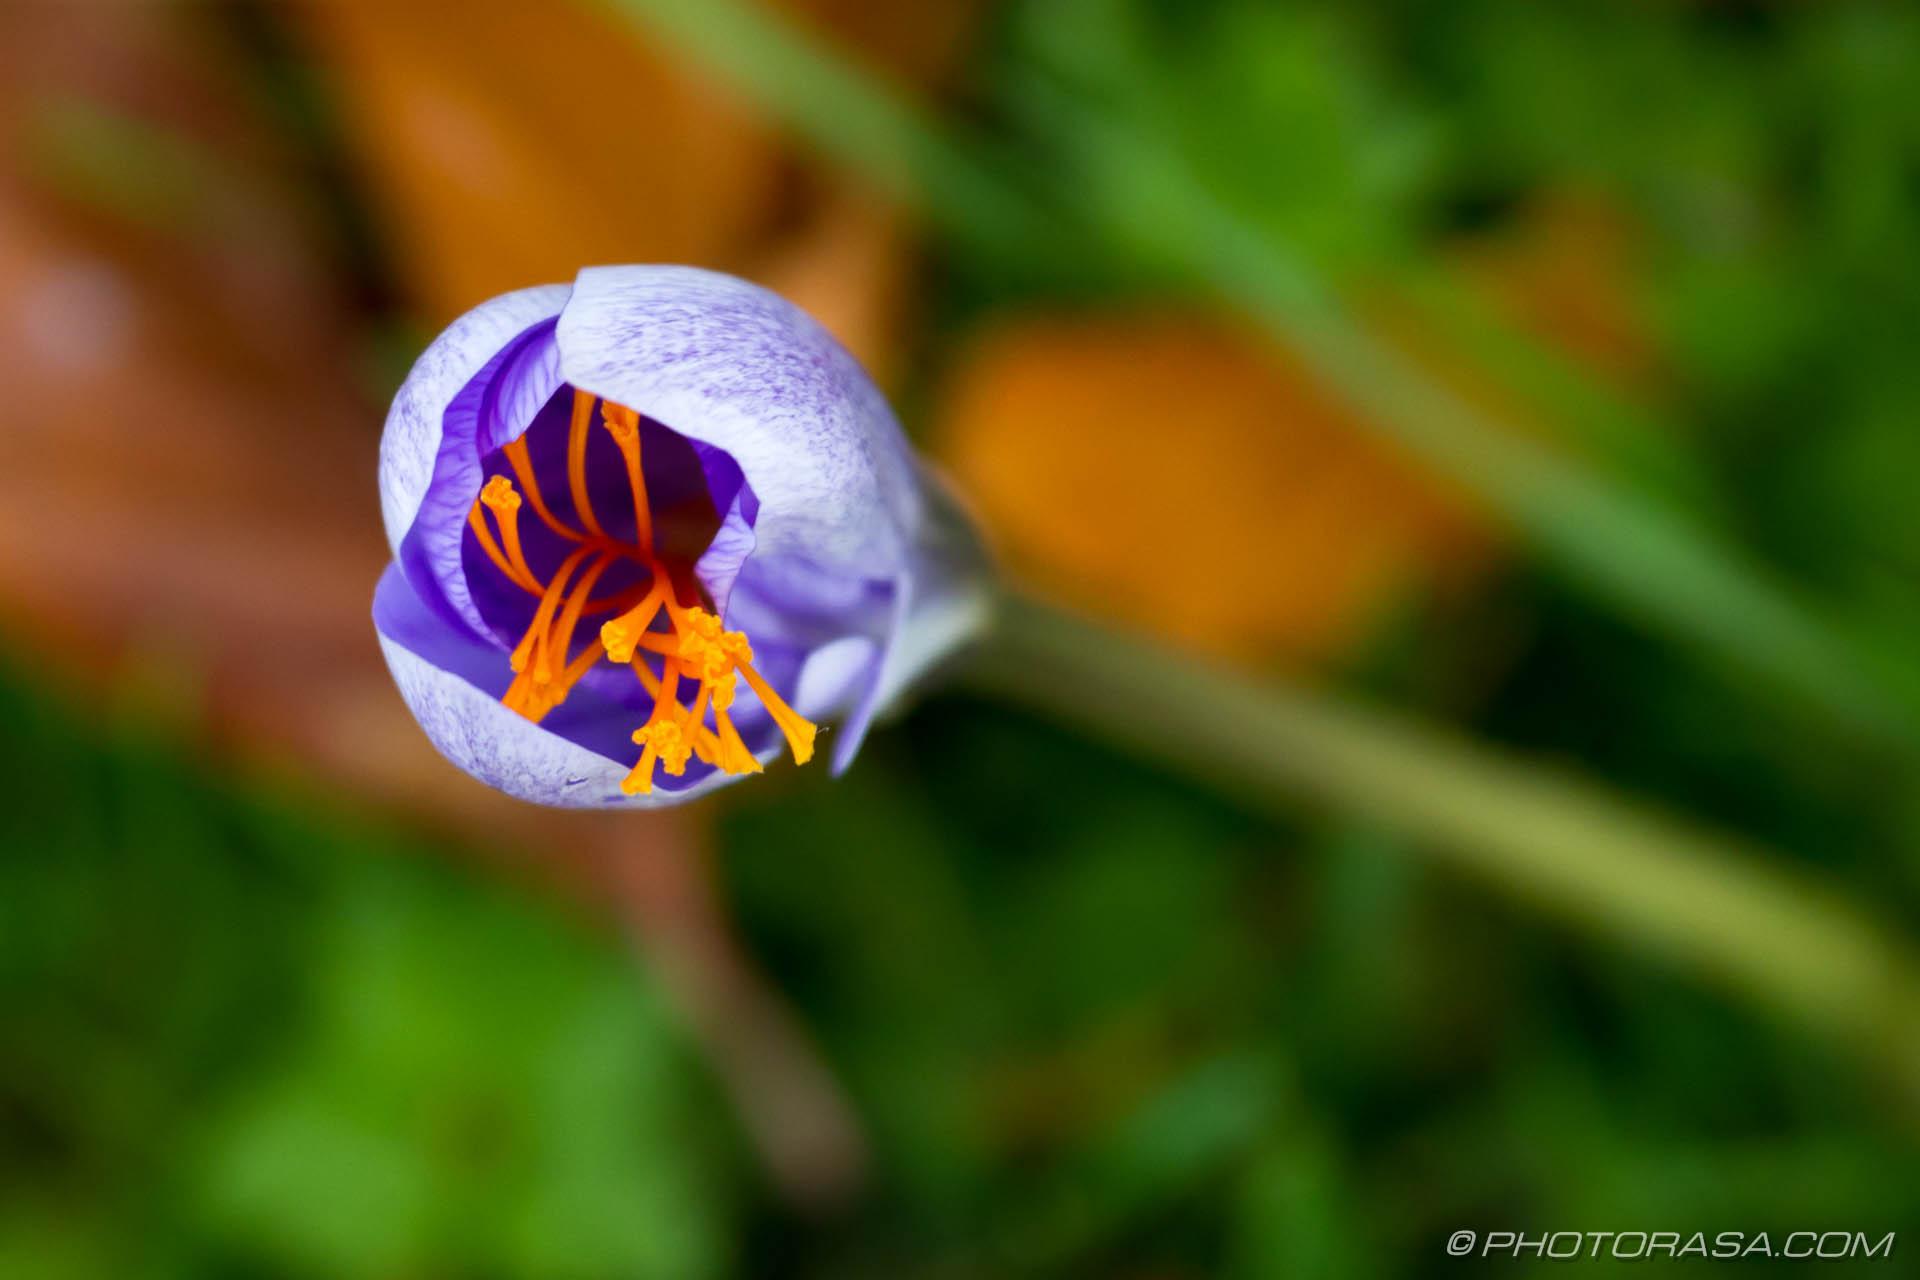 https://photorasa.com/purple-autumn-crocuses/shot-from-above-showing-orange-stamen-inside-purple-petals/